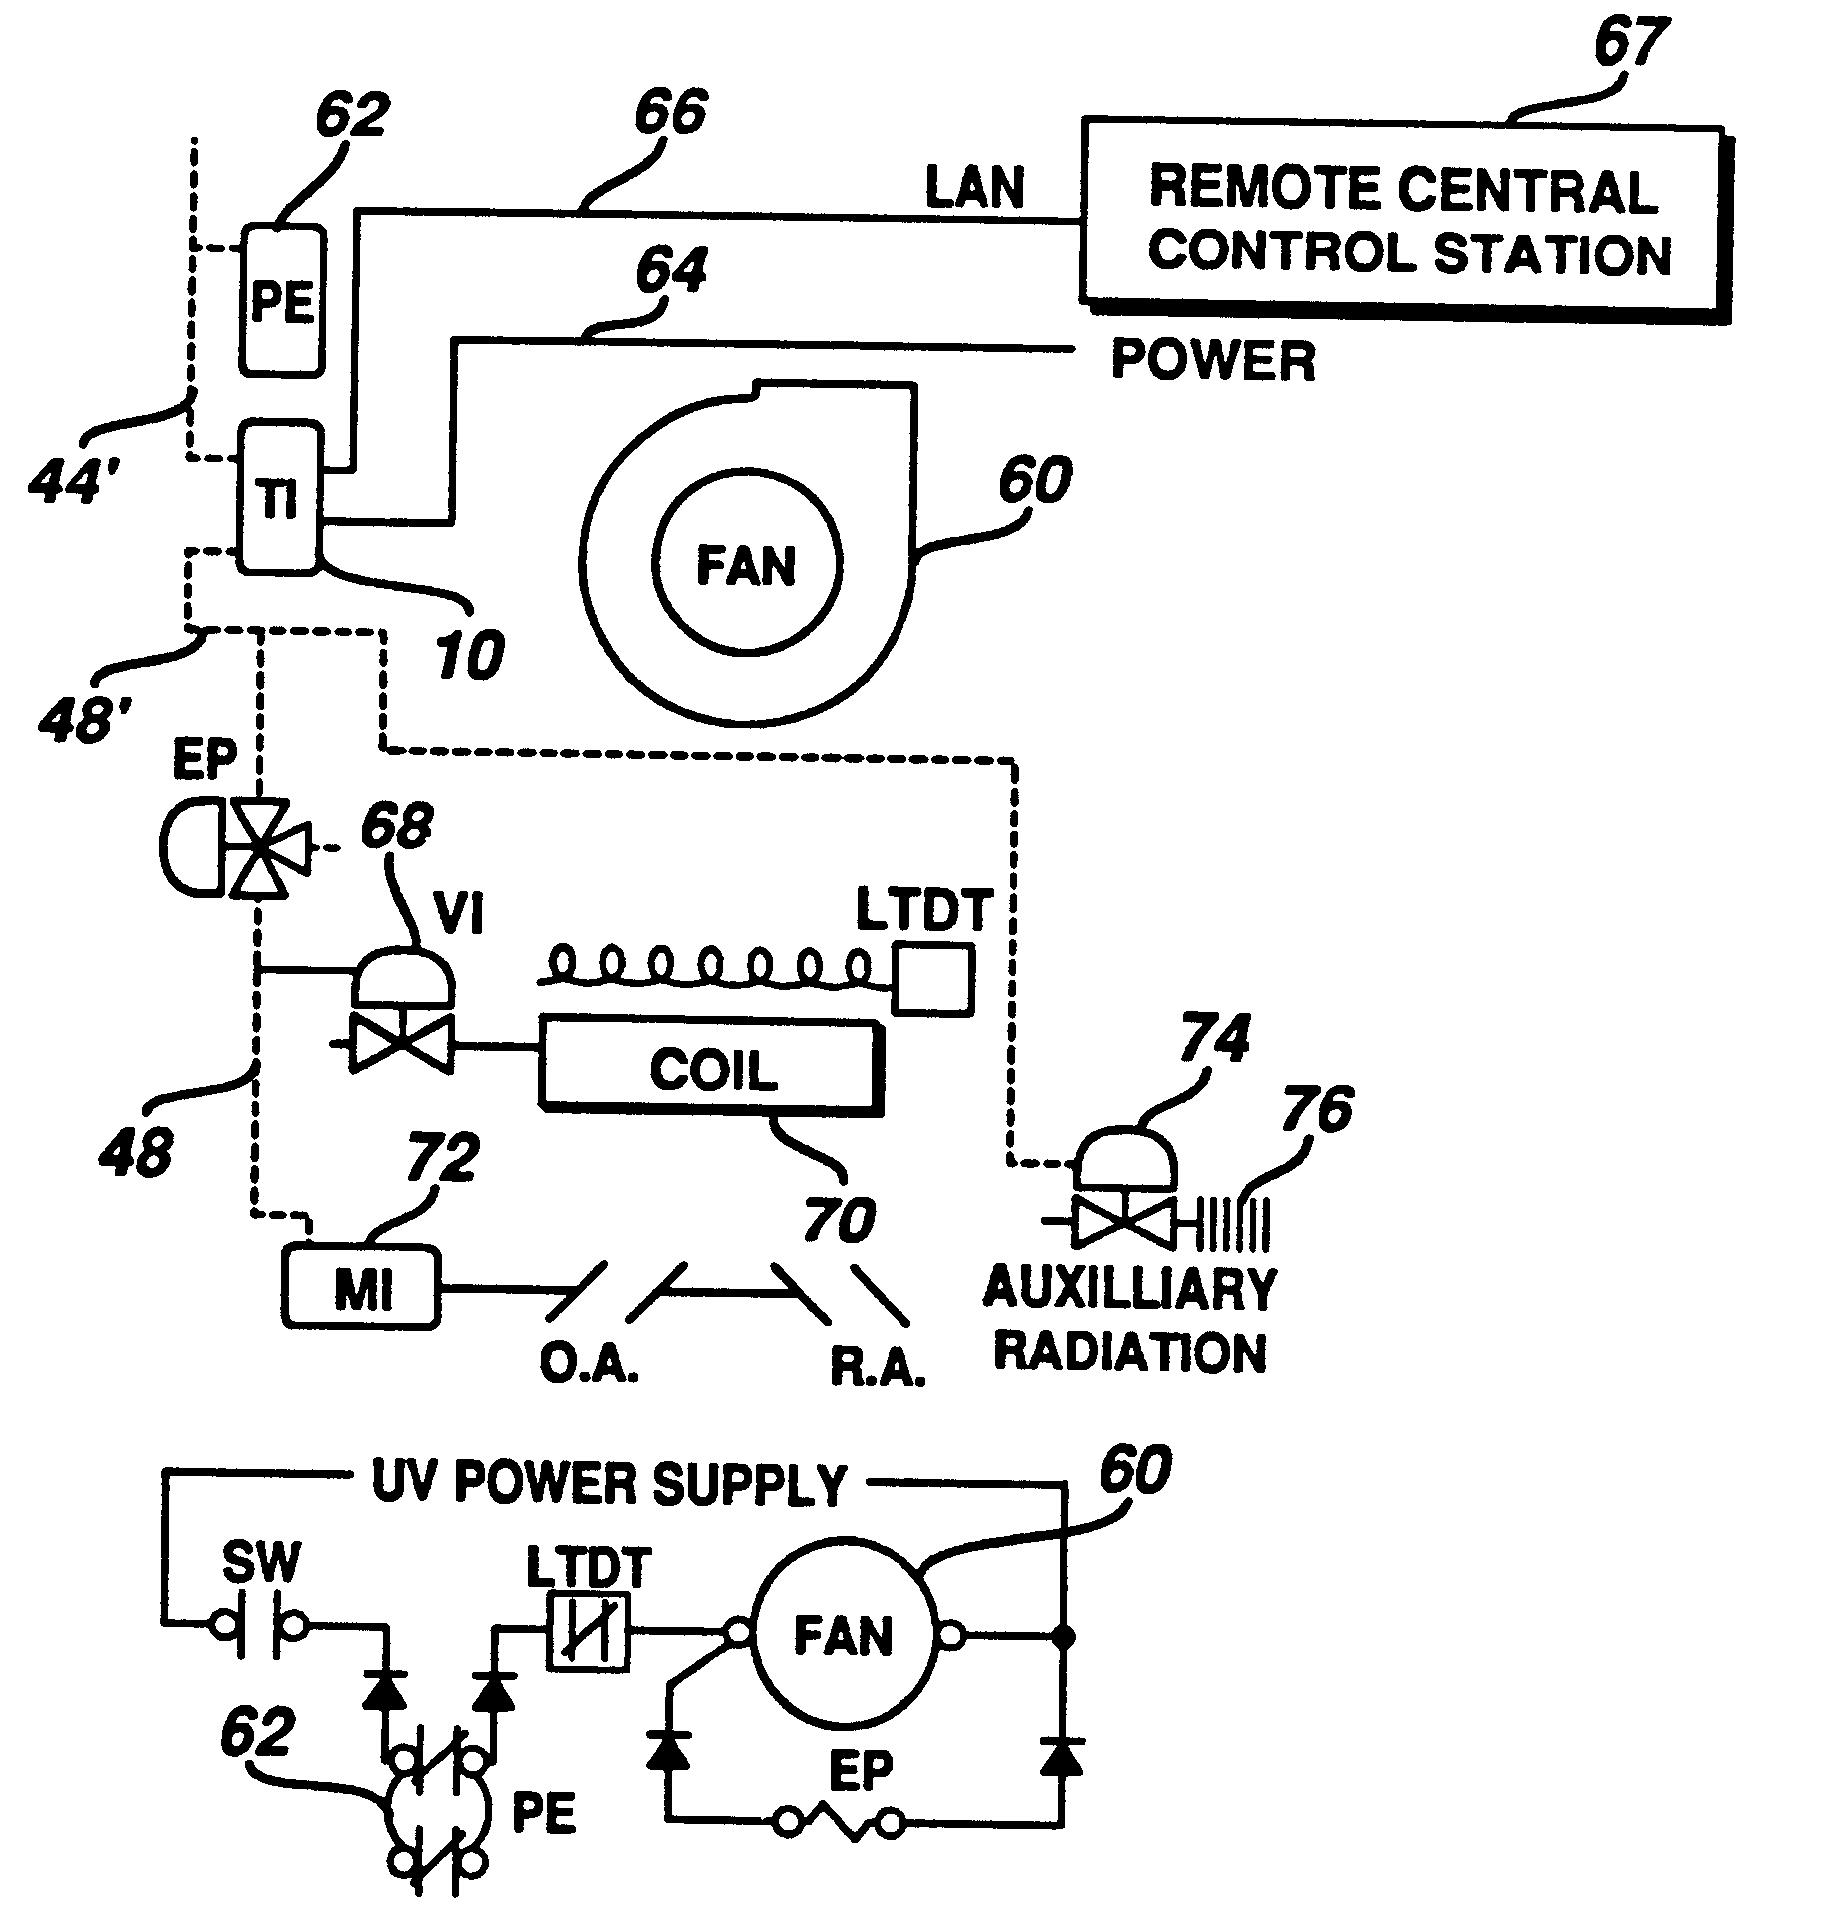 honeywell pressure transmitter wiring diagram tub and shower plumbing economizer heat pump